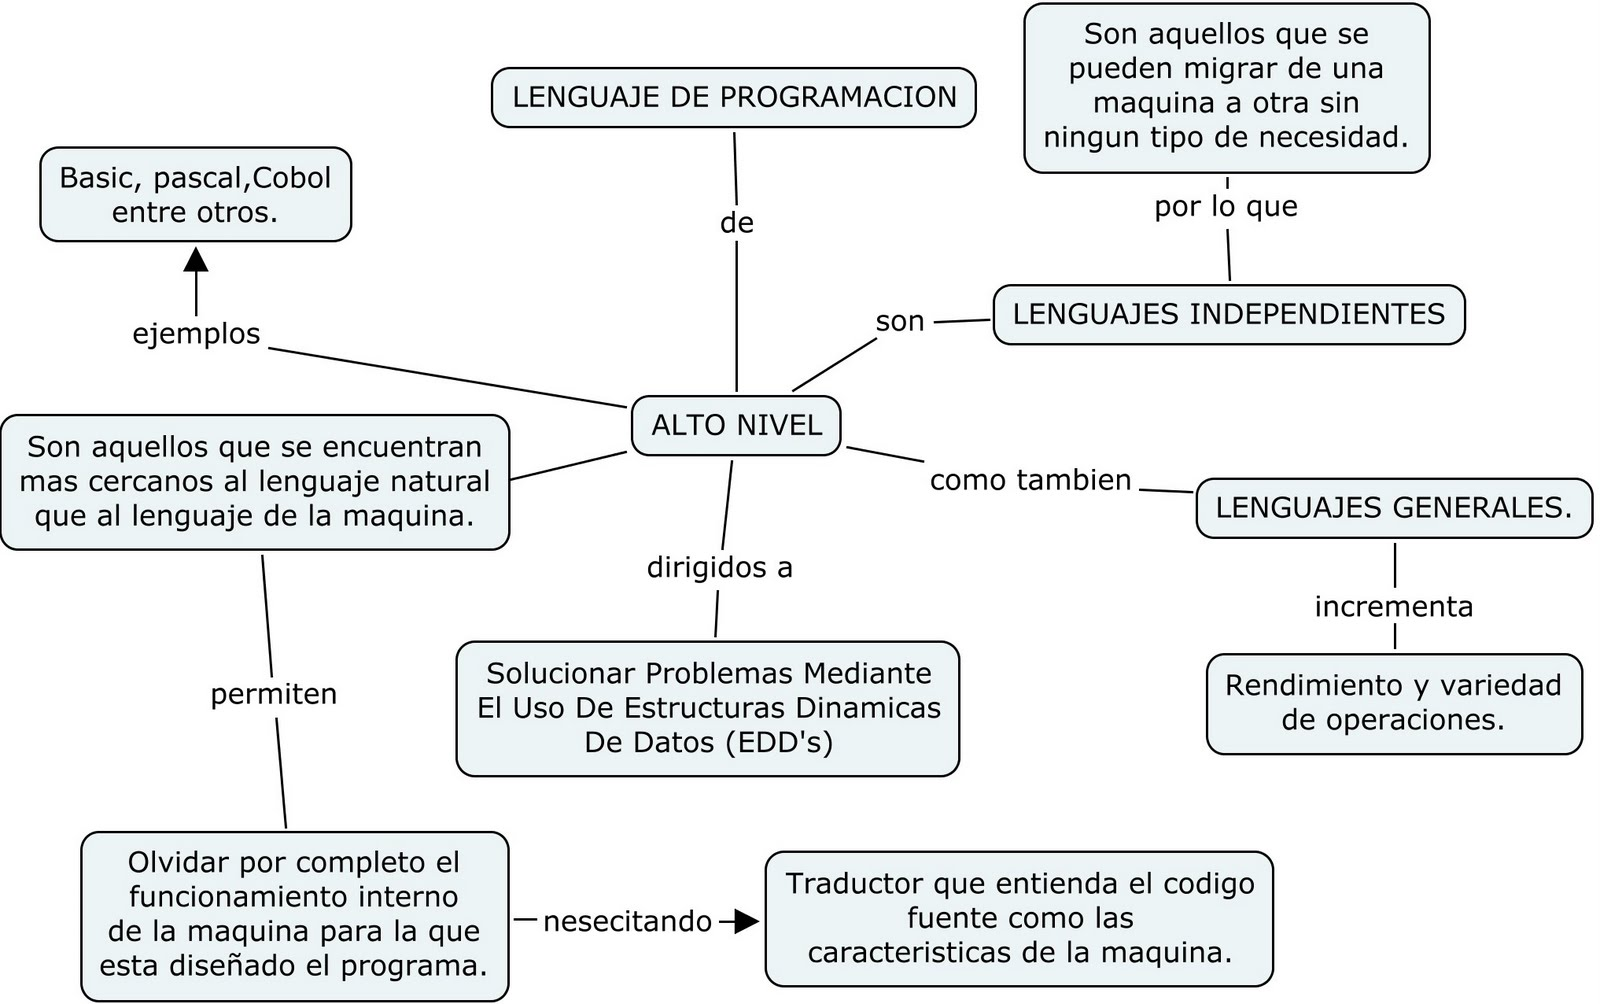 lenguaje alto y bajo nivel: